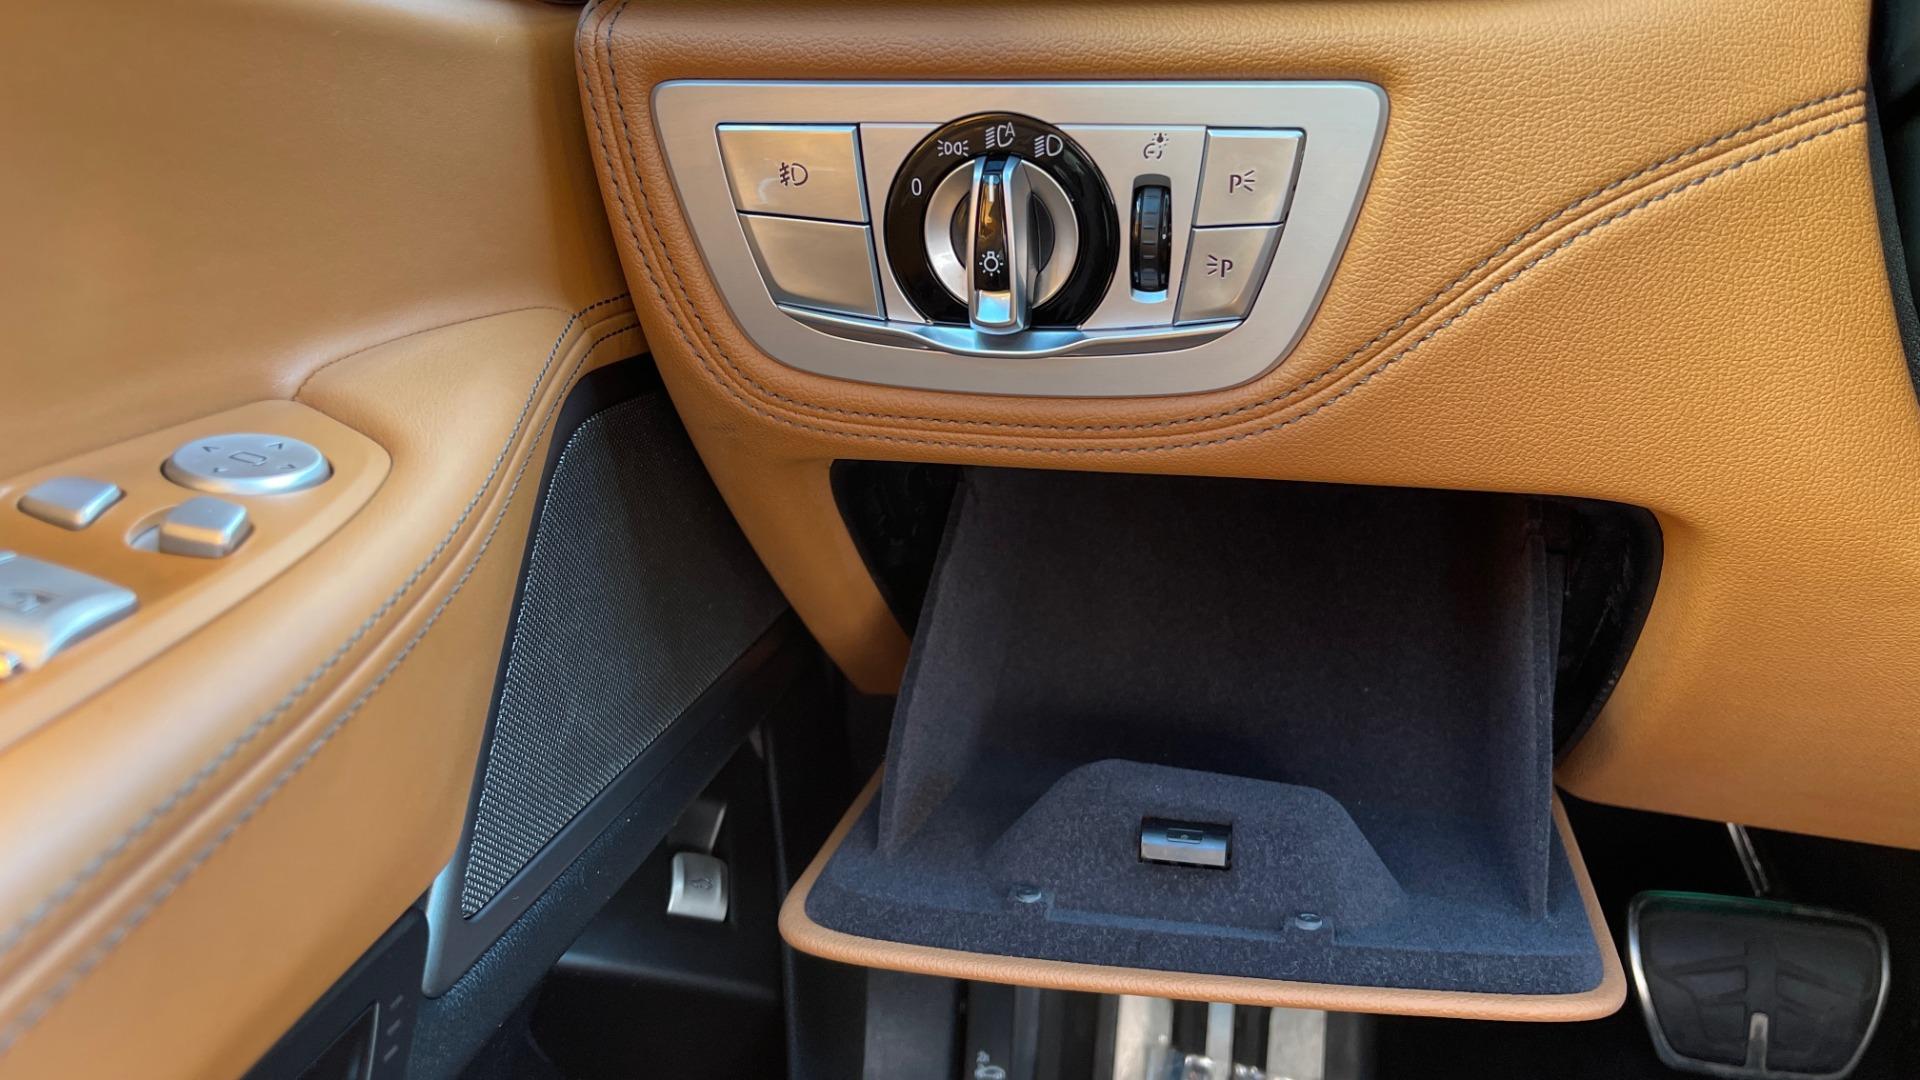 Used 2019 BMW 7 SERIES 750I XDRIVE M-SPORT / EXEC PKG / DRVR ASST PLUS / CLD WTHR / PAR for sale $60,995 at Formula Imports in Charlotte NC 28227 28